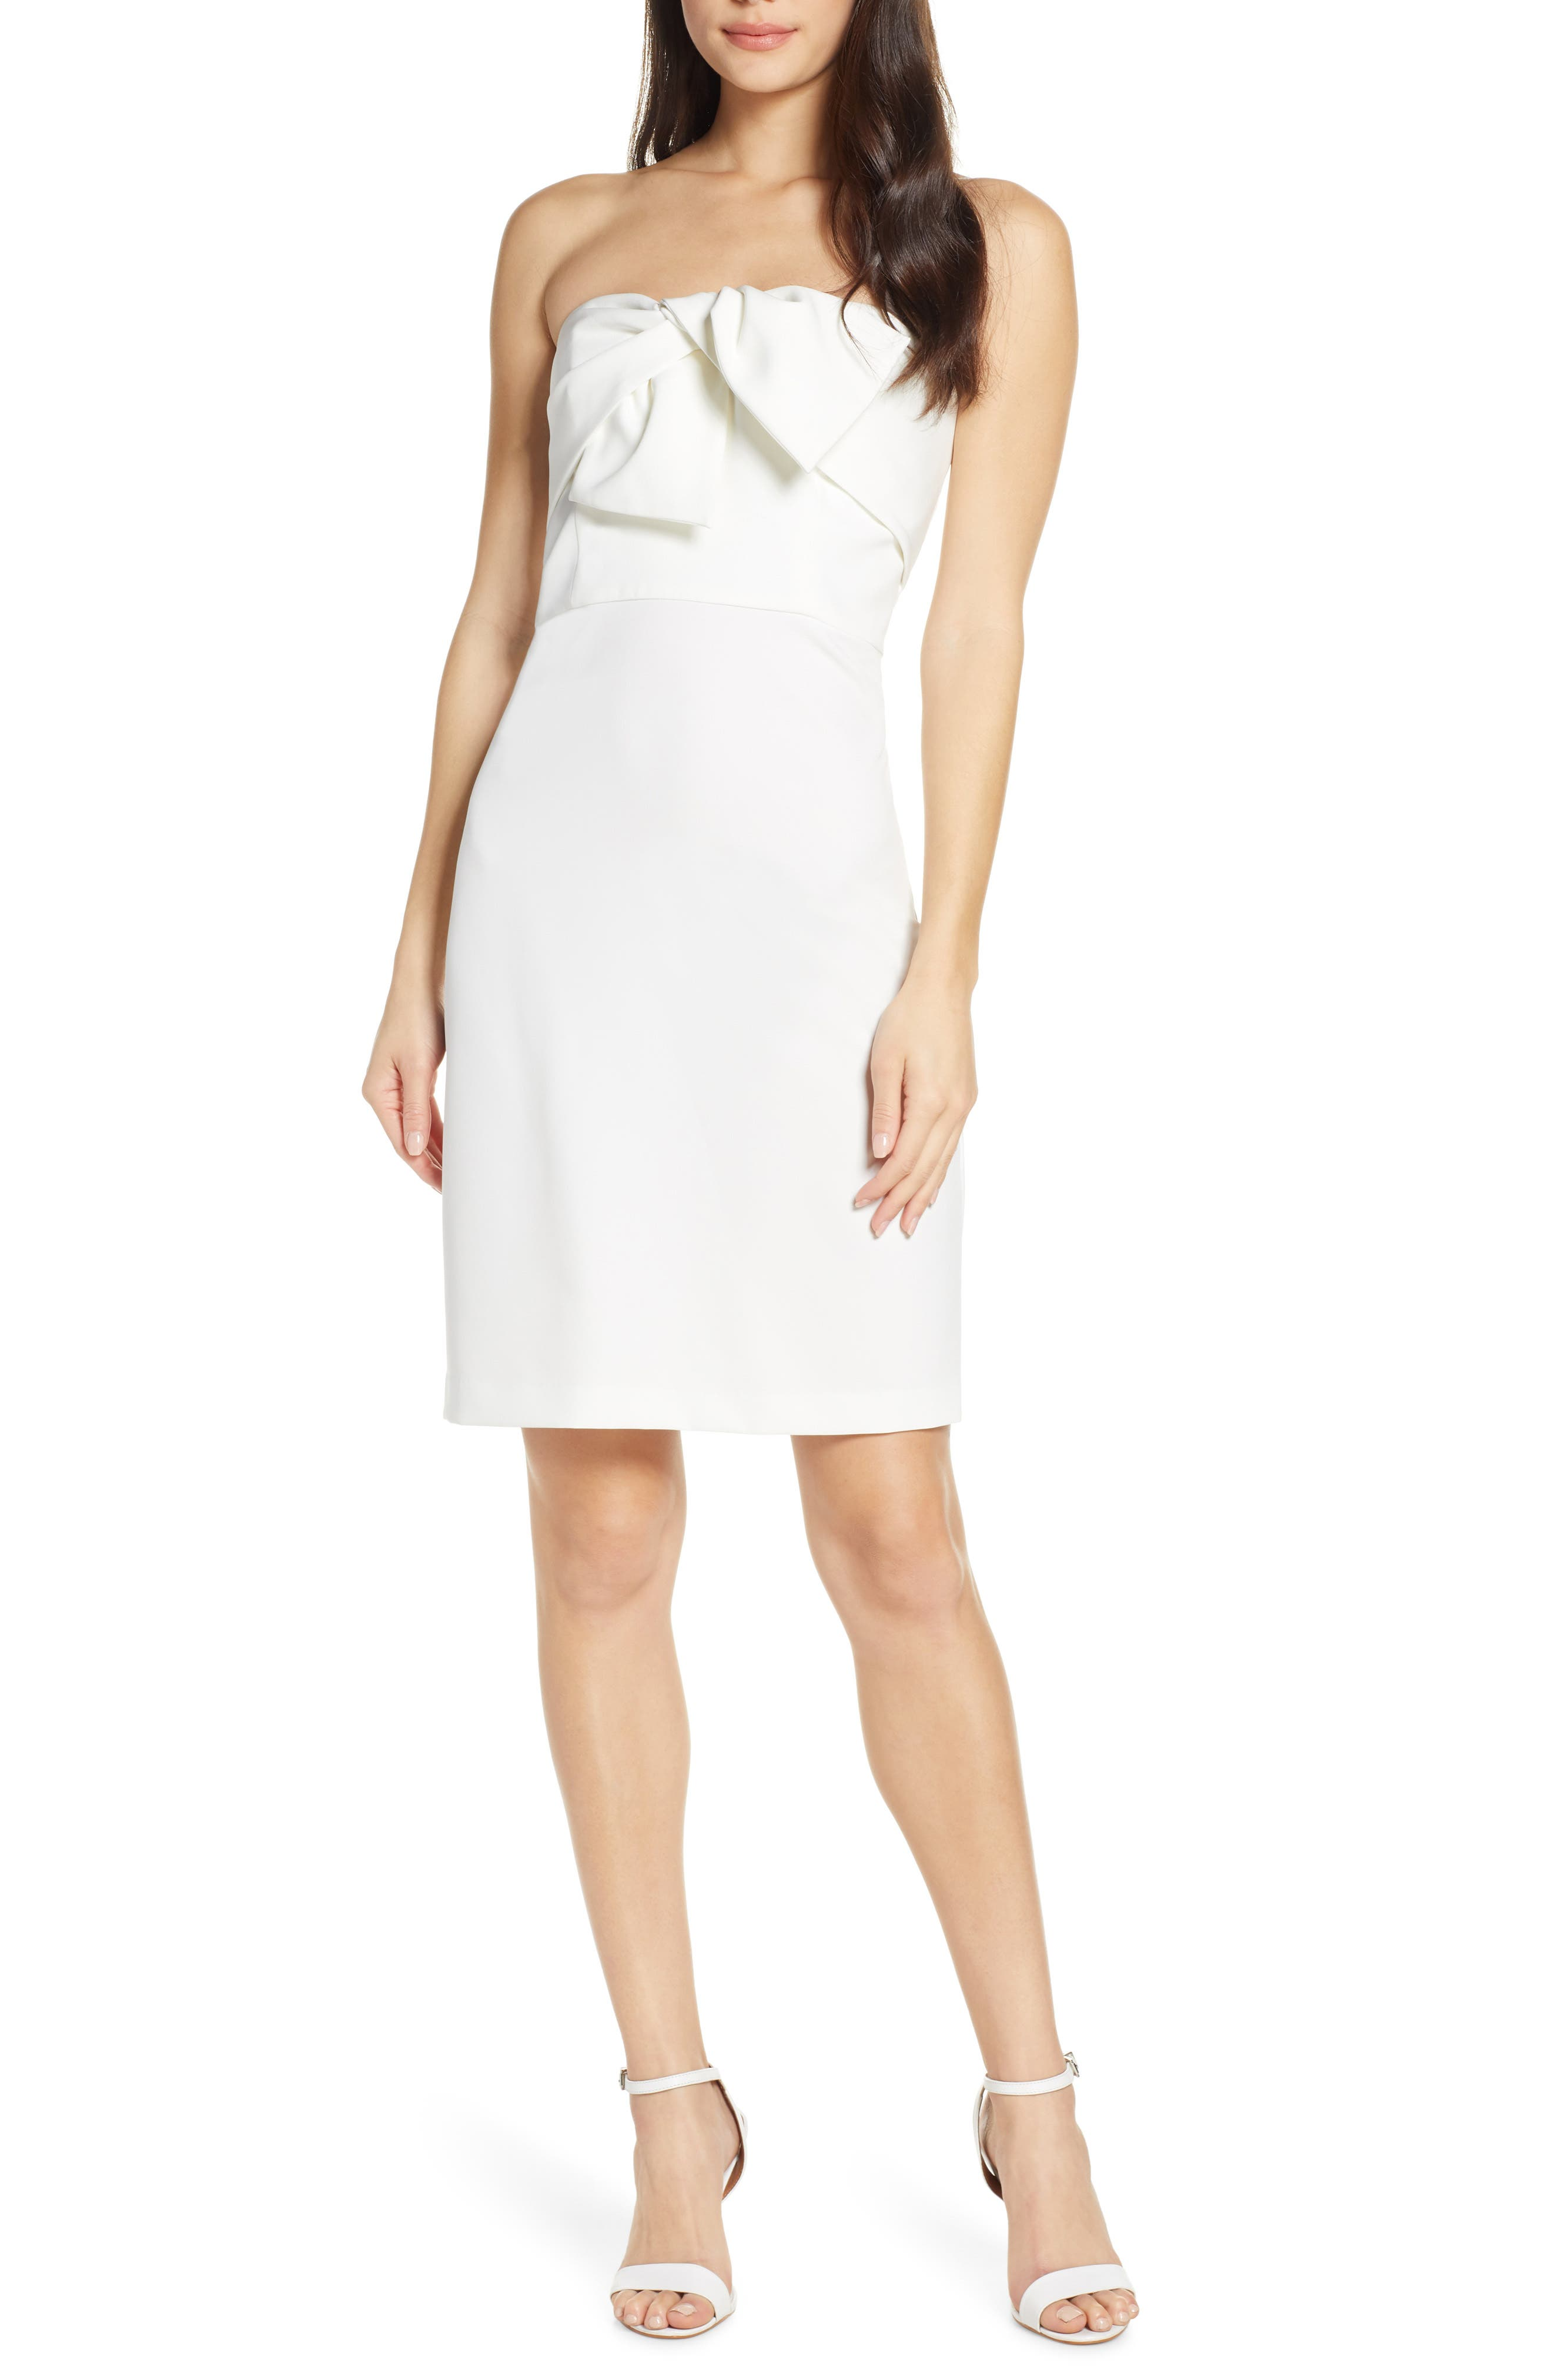 Sam Edelman Bow Front Strapless Sheath Dress, Ivory